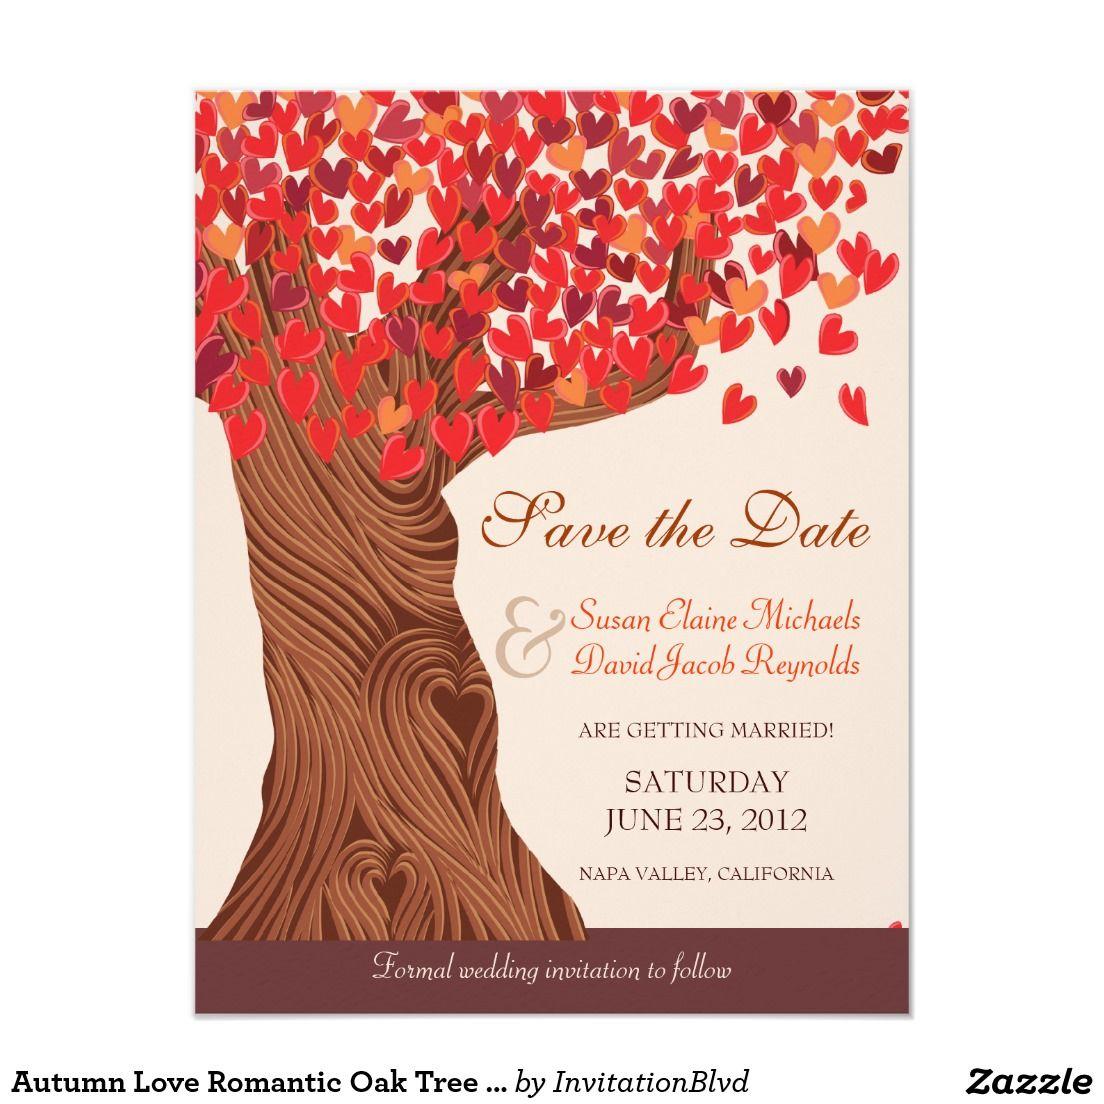 Autumn Love Romantic Oak Tree Save the Date 4.25x5.5 Paper ...